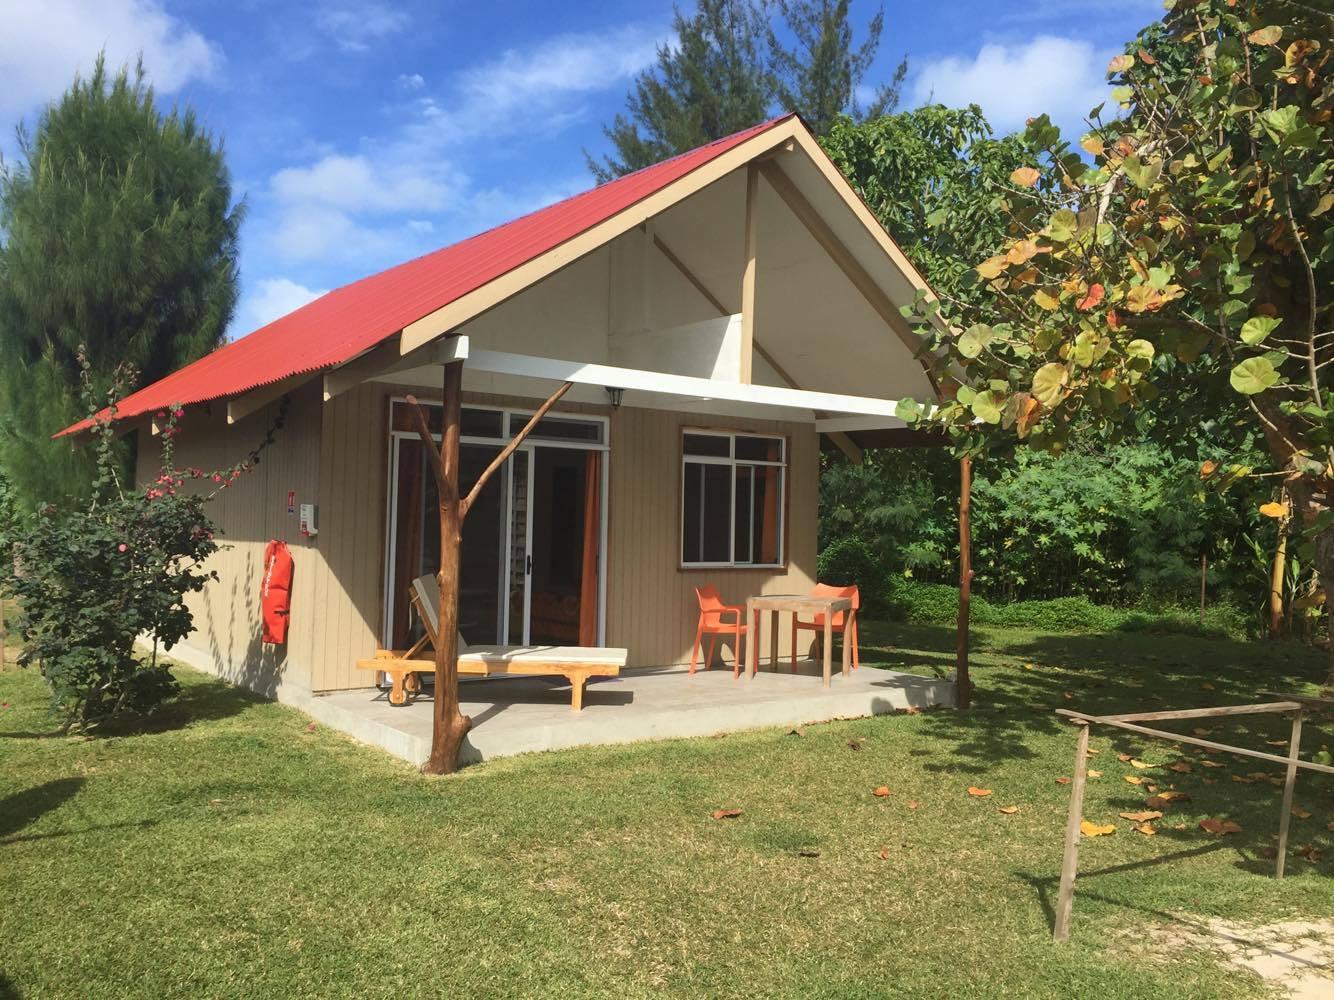 https://tahititourisme.de/wp-content/uploads/2018/07/TUB-Tubuai-Wipa-Lodge_Room_Bungalow-5.jpg